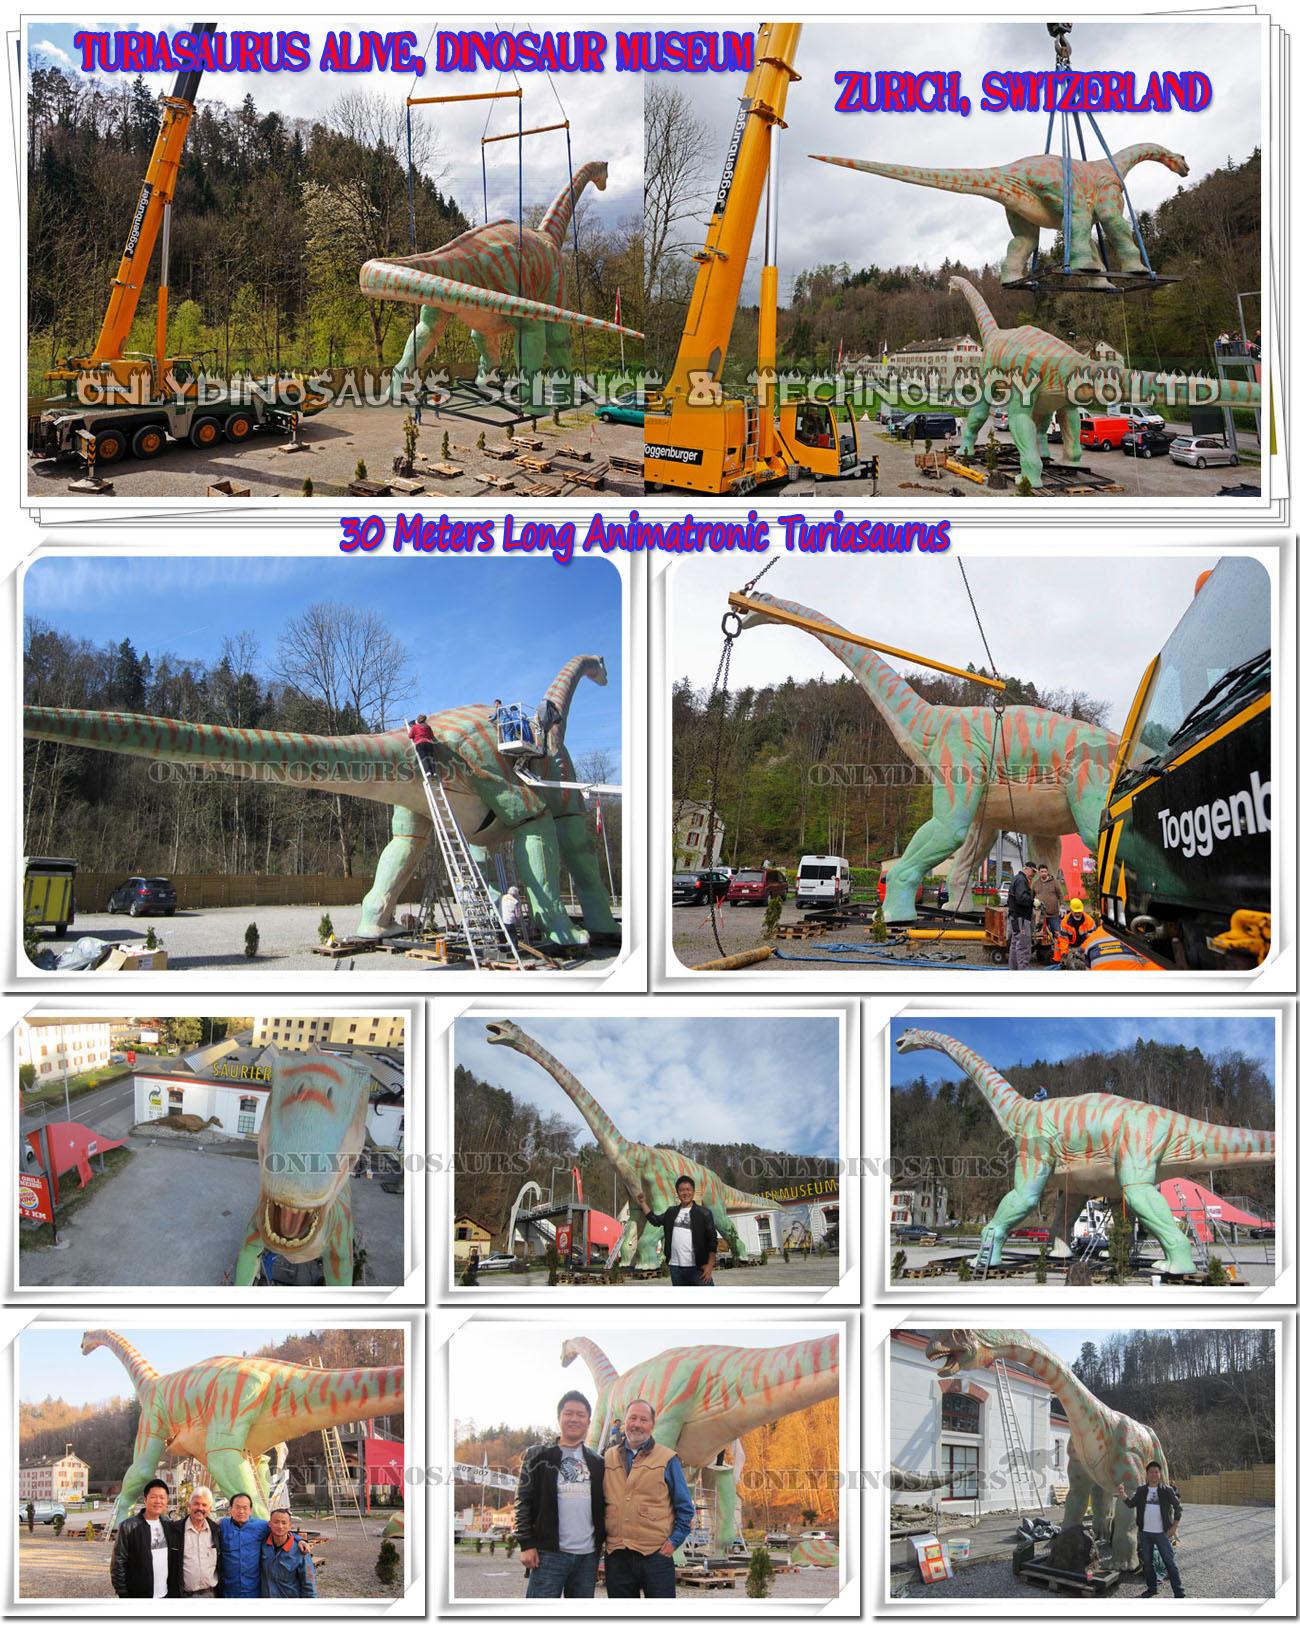 Installing Animatronic Turiasaurus